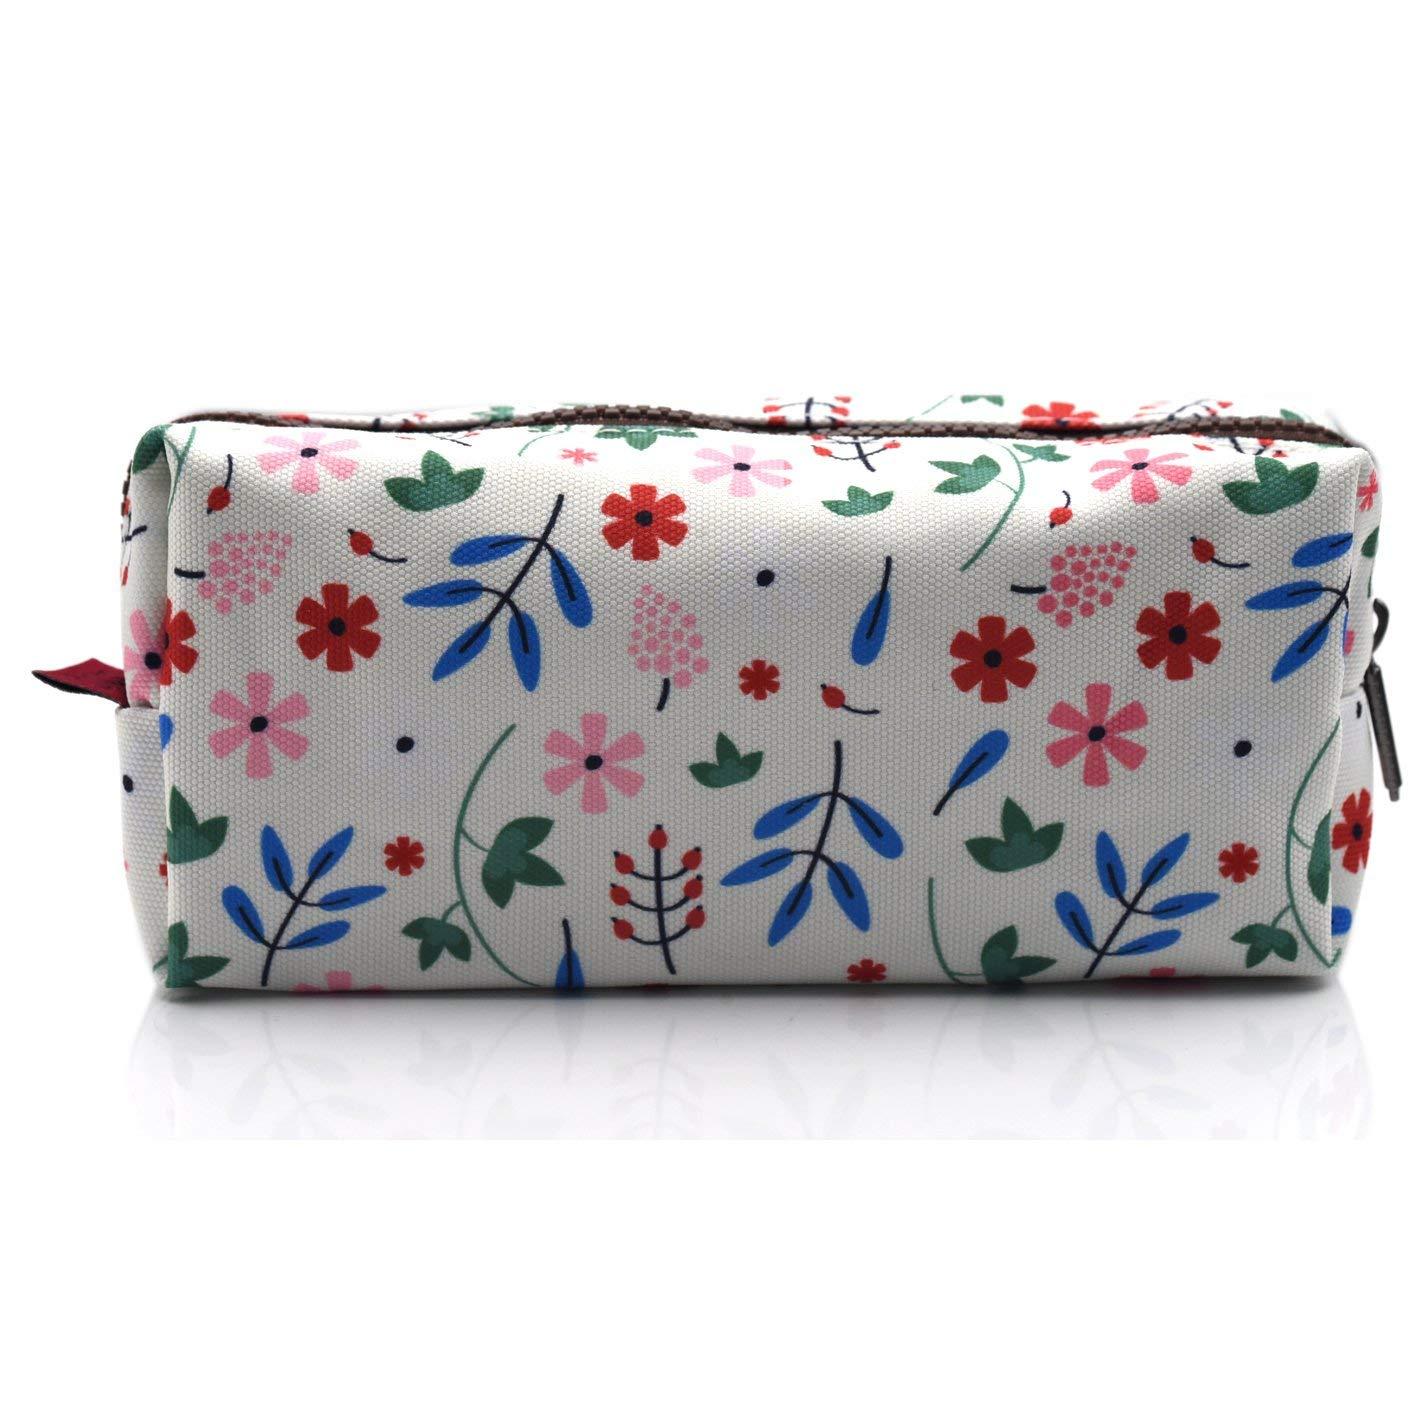 LParkin Floral Students Super Large Capacity Canvas Pencil Case Pen Bag Pouch Stationary Case Makeup Cosmetic Bag (White)